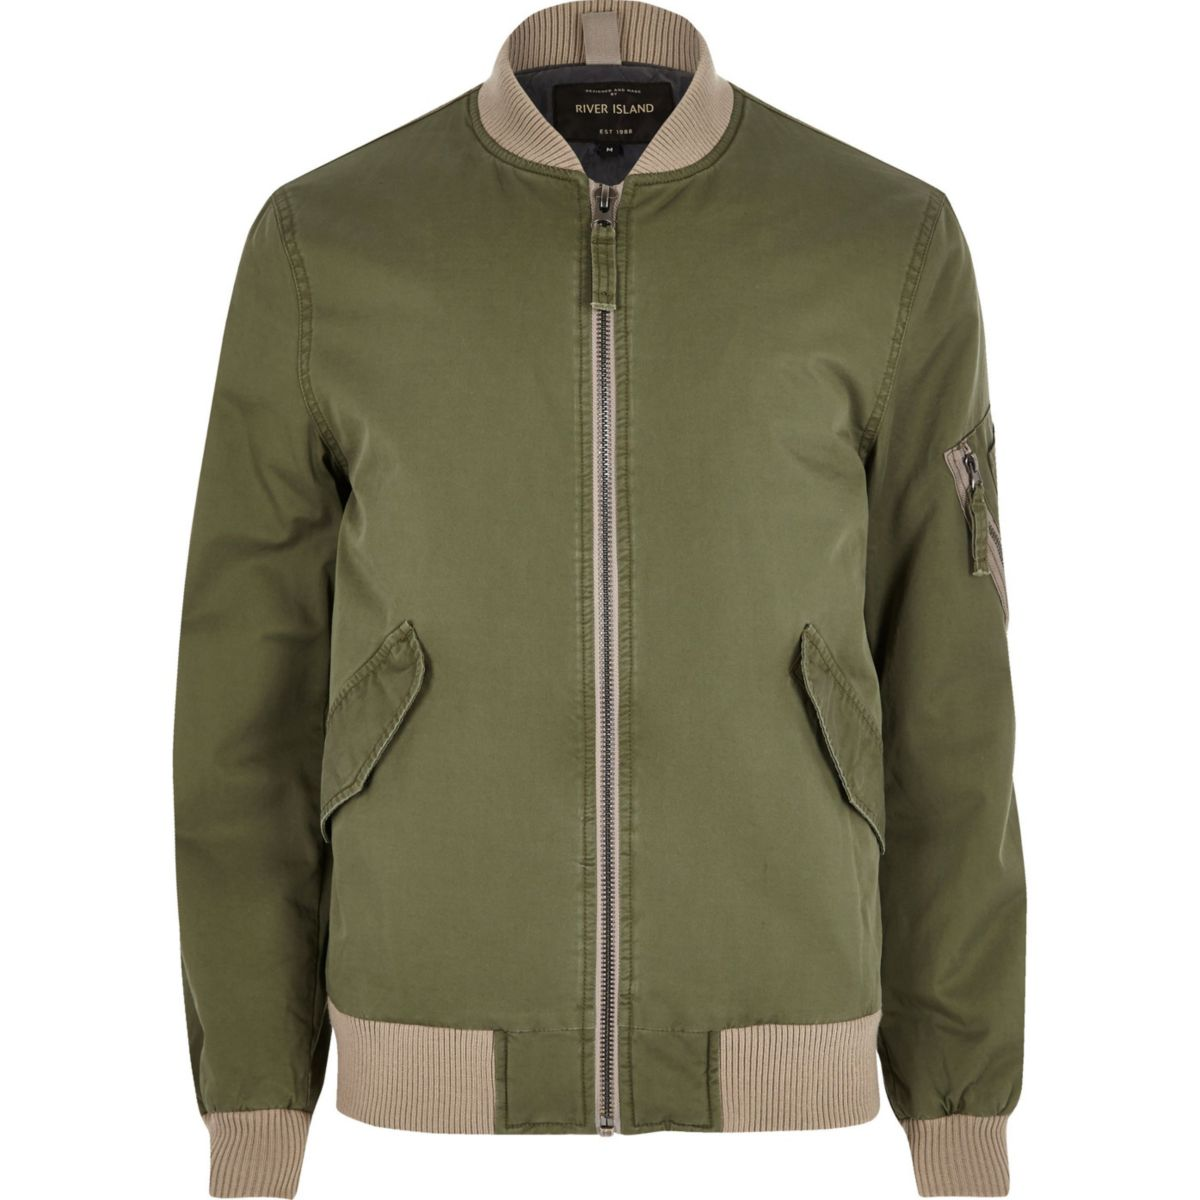 Big and Tall khaki green bomber jacket